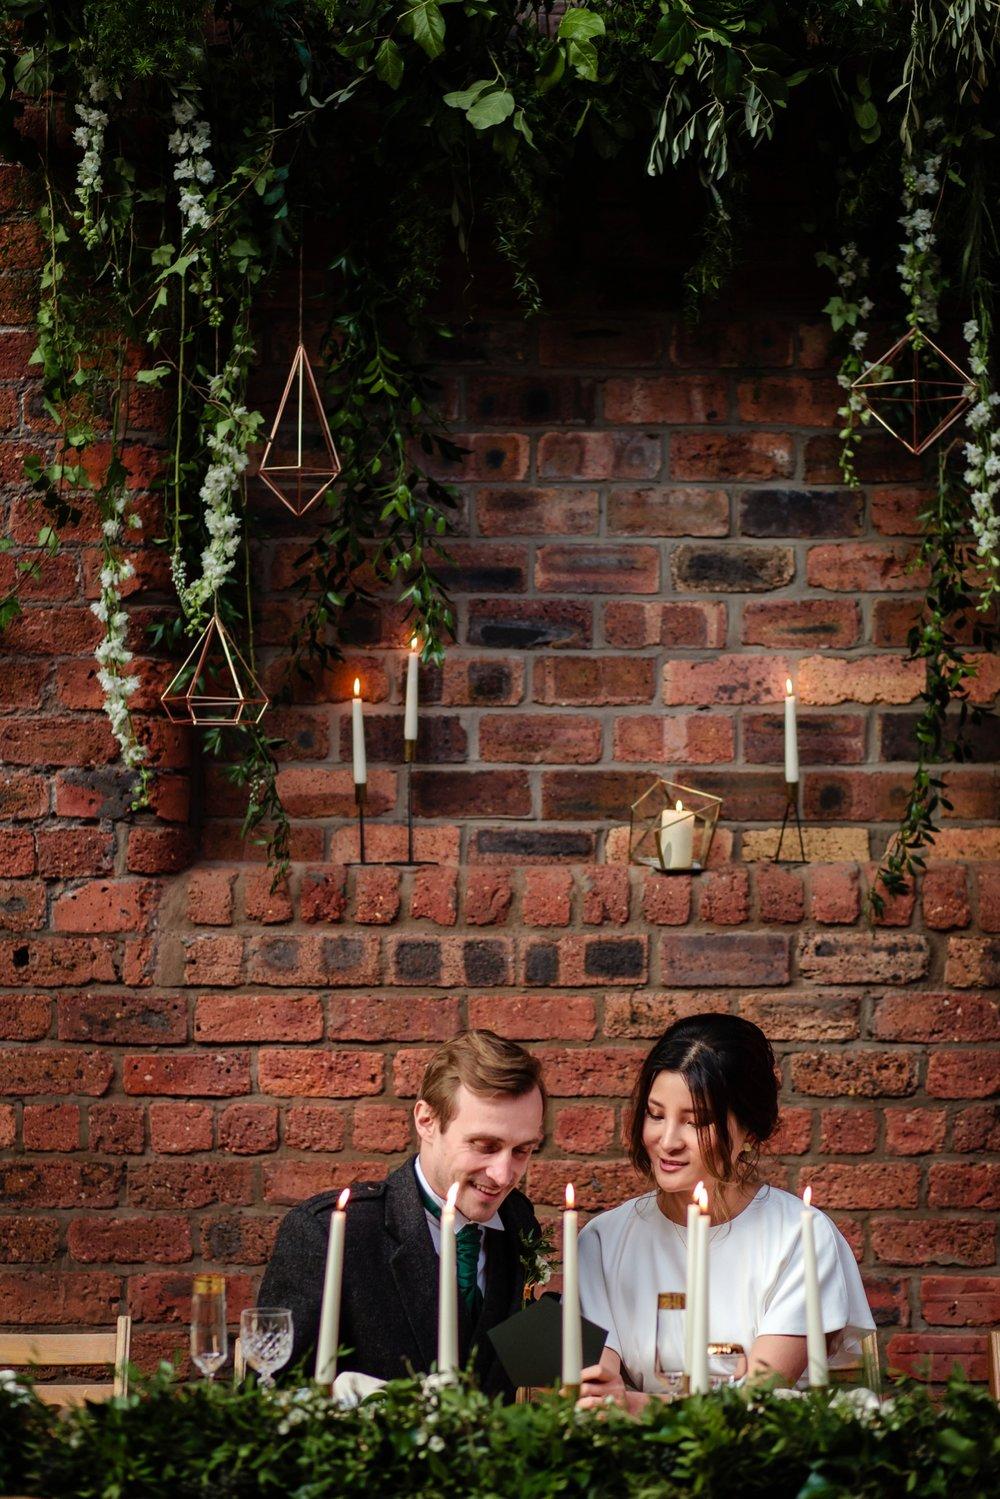 engine-works-wedding-styled-shoot-fotomaki-photography-161.jpg